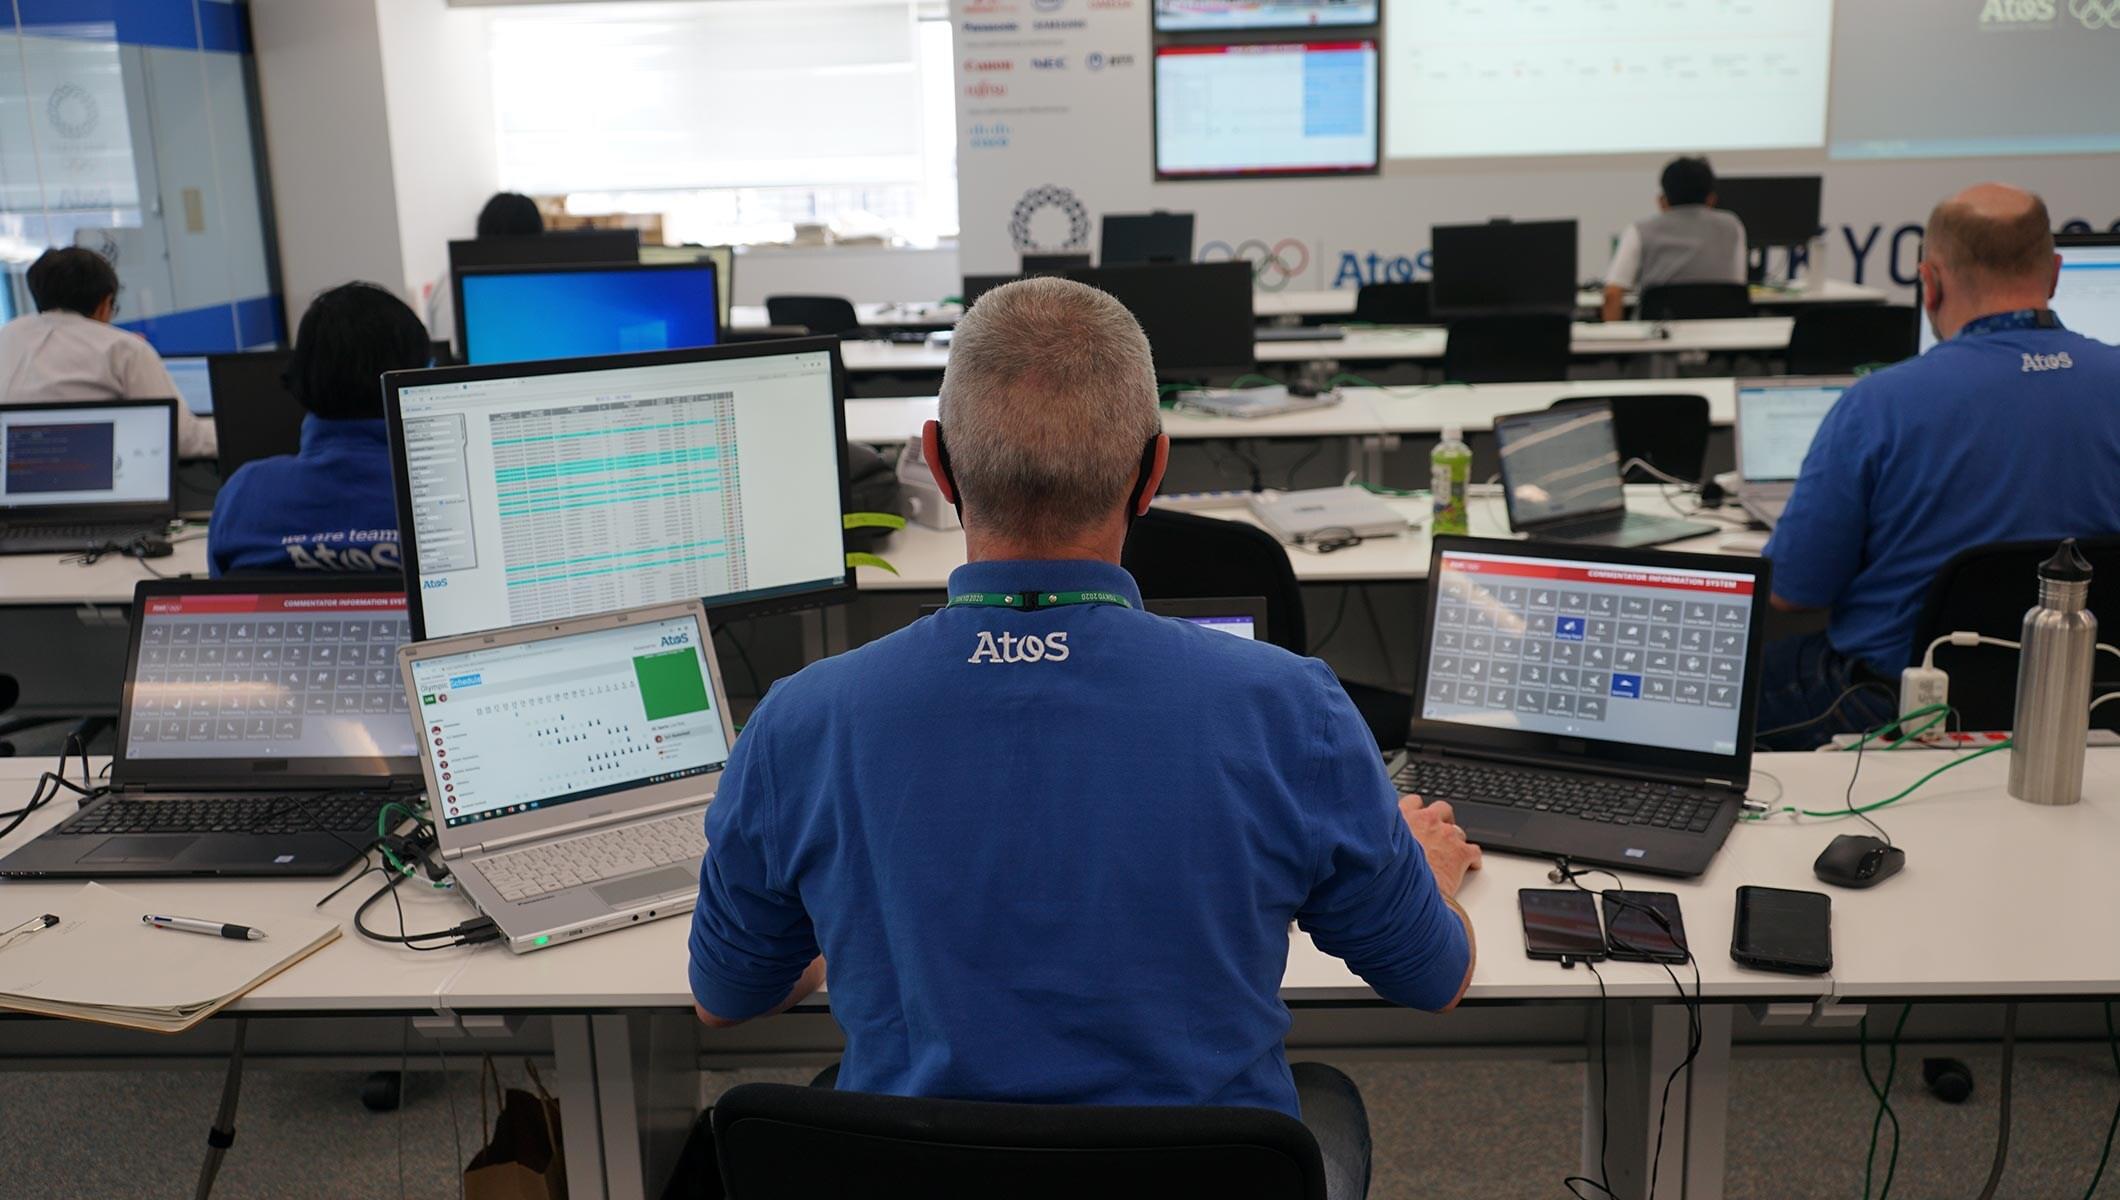 Atos technology staff working at Tokyo 2020